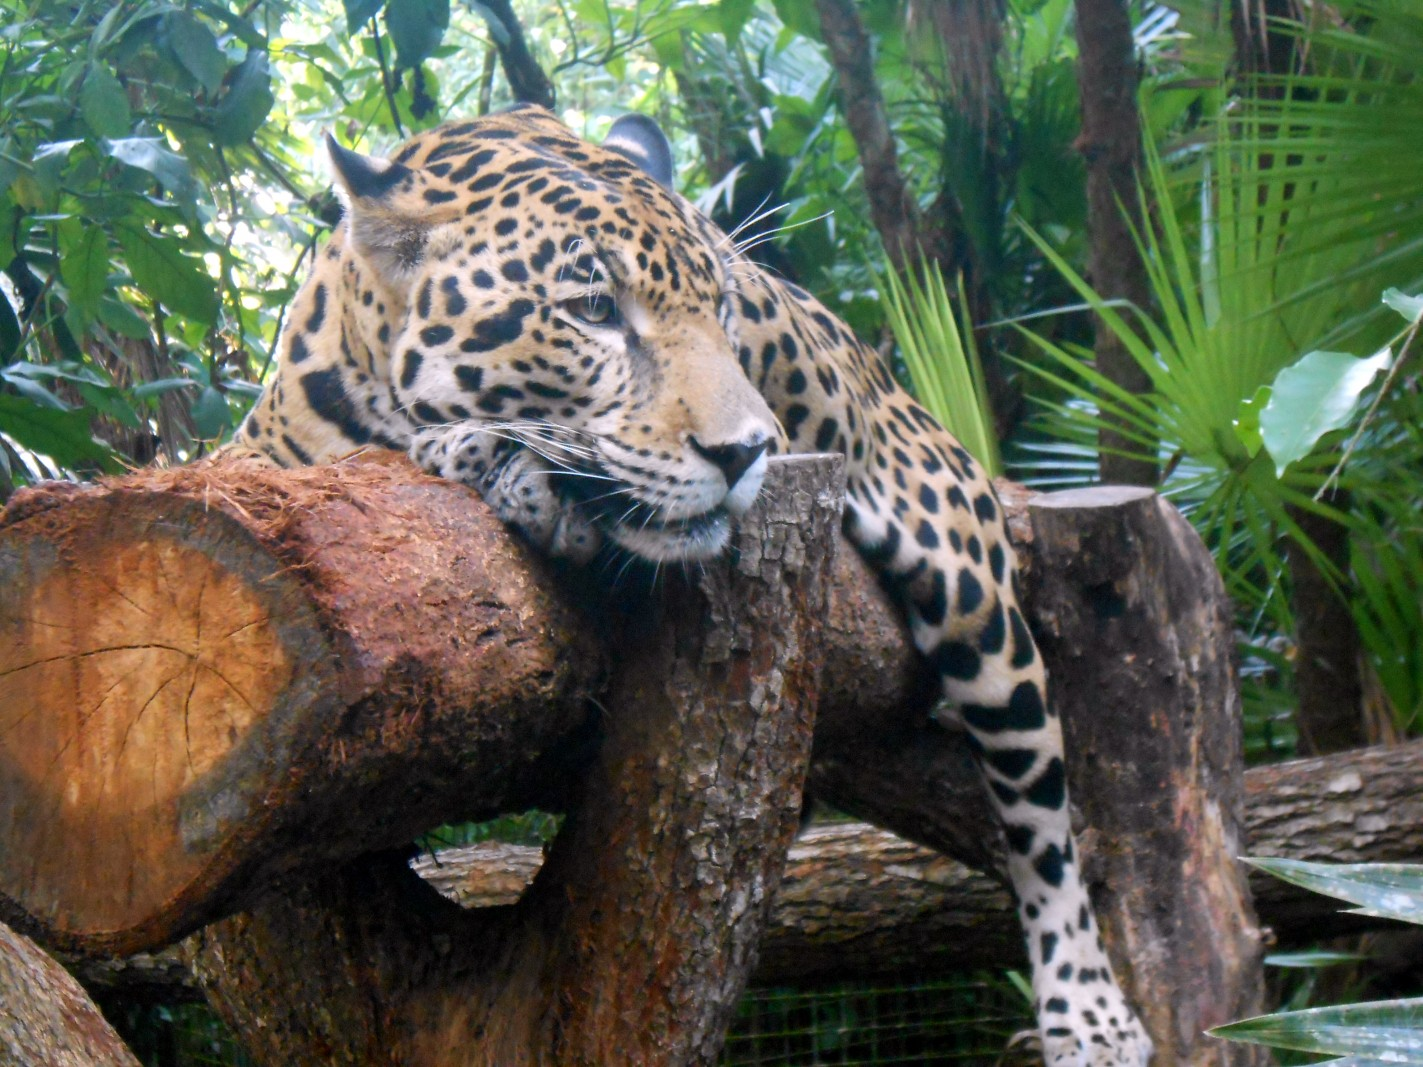 Junior the Jaguar